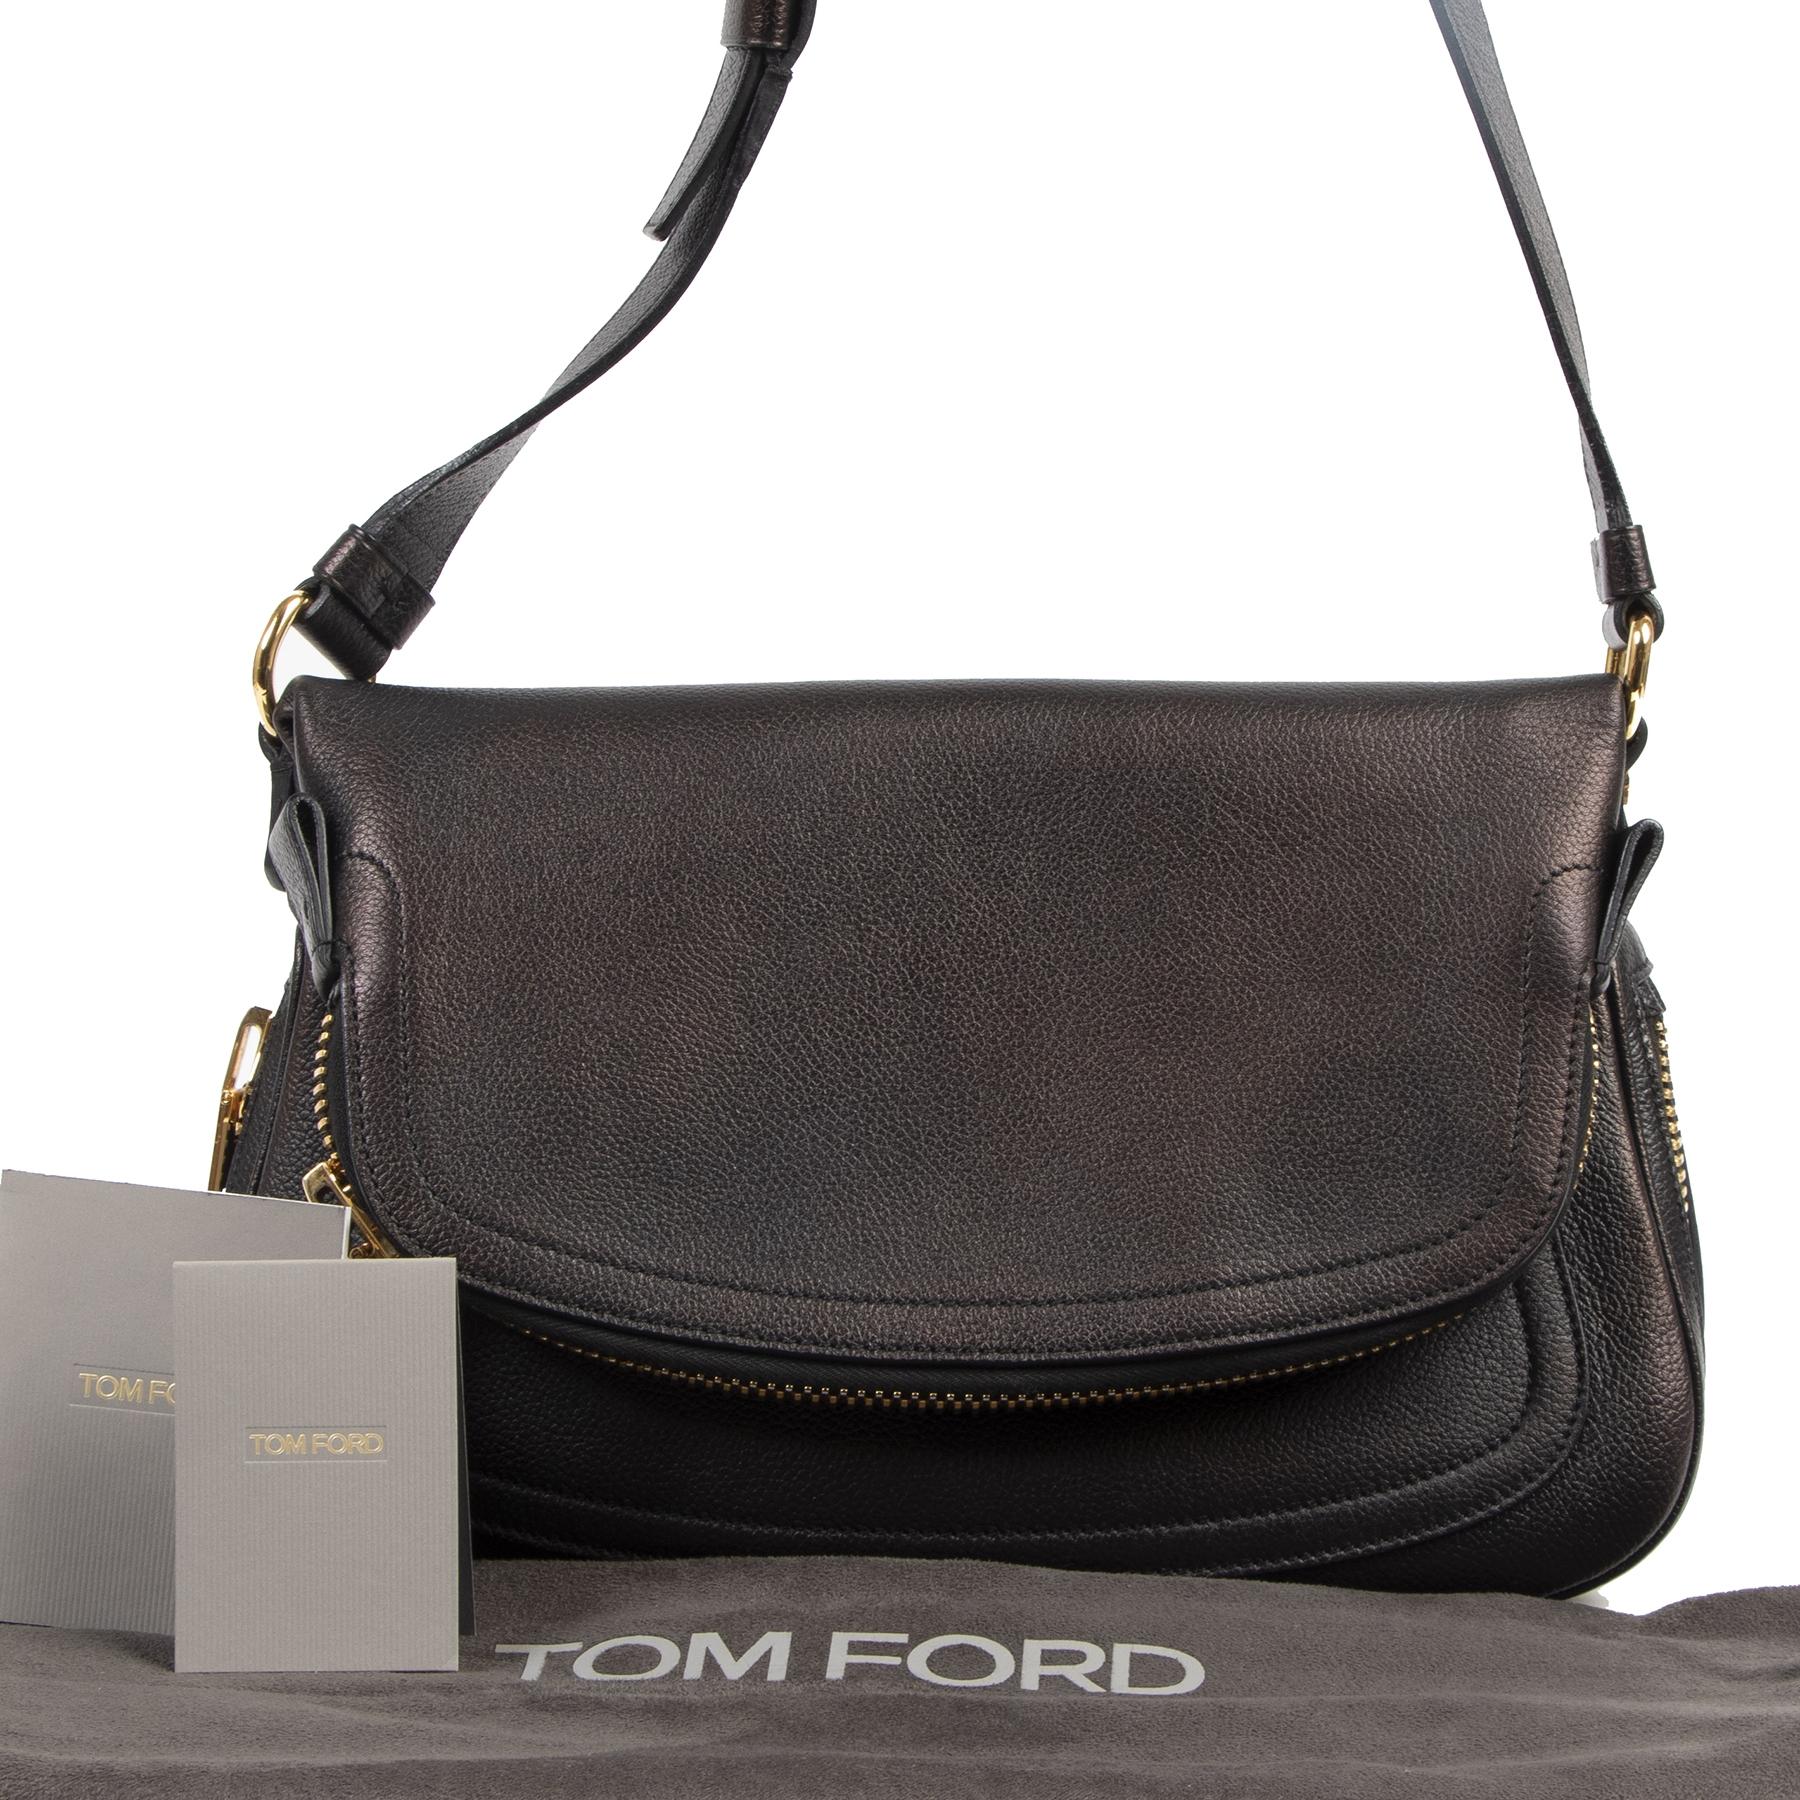 Authentieke tweedehands vintage Tom Ford Jennifer Black Leather Medium Crossbody Bag koop online webshop LabelLOV